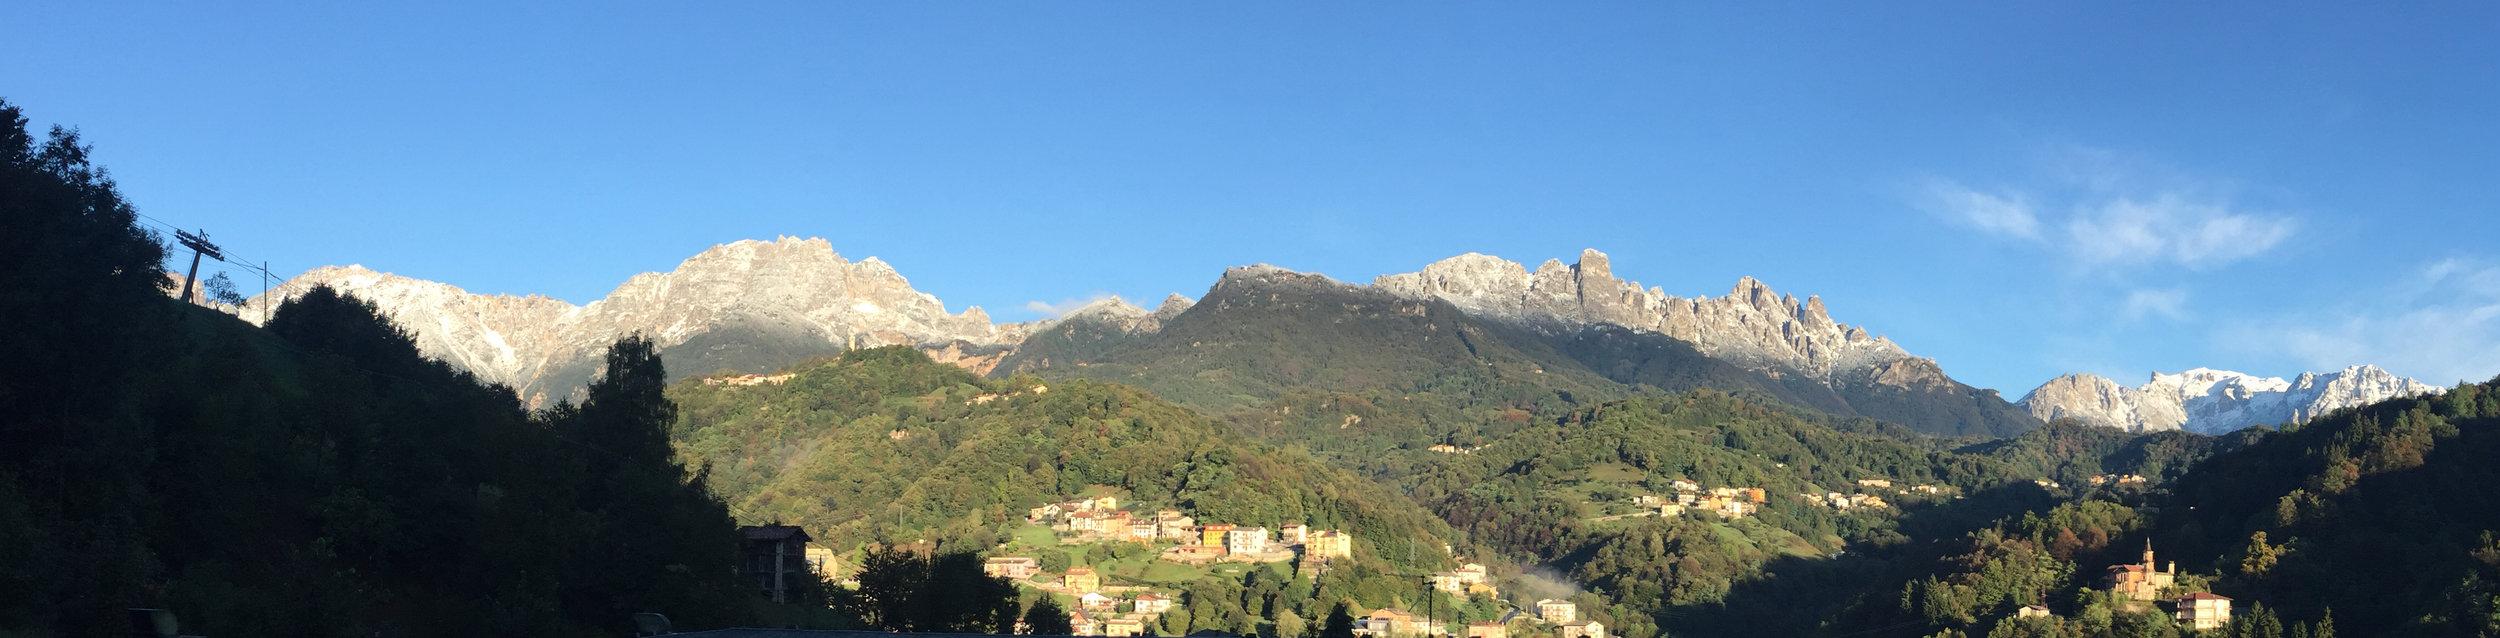 Panoramica Piccole con neve 6102016.jpg